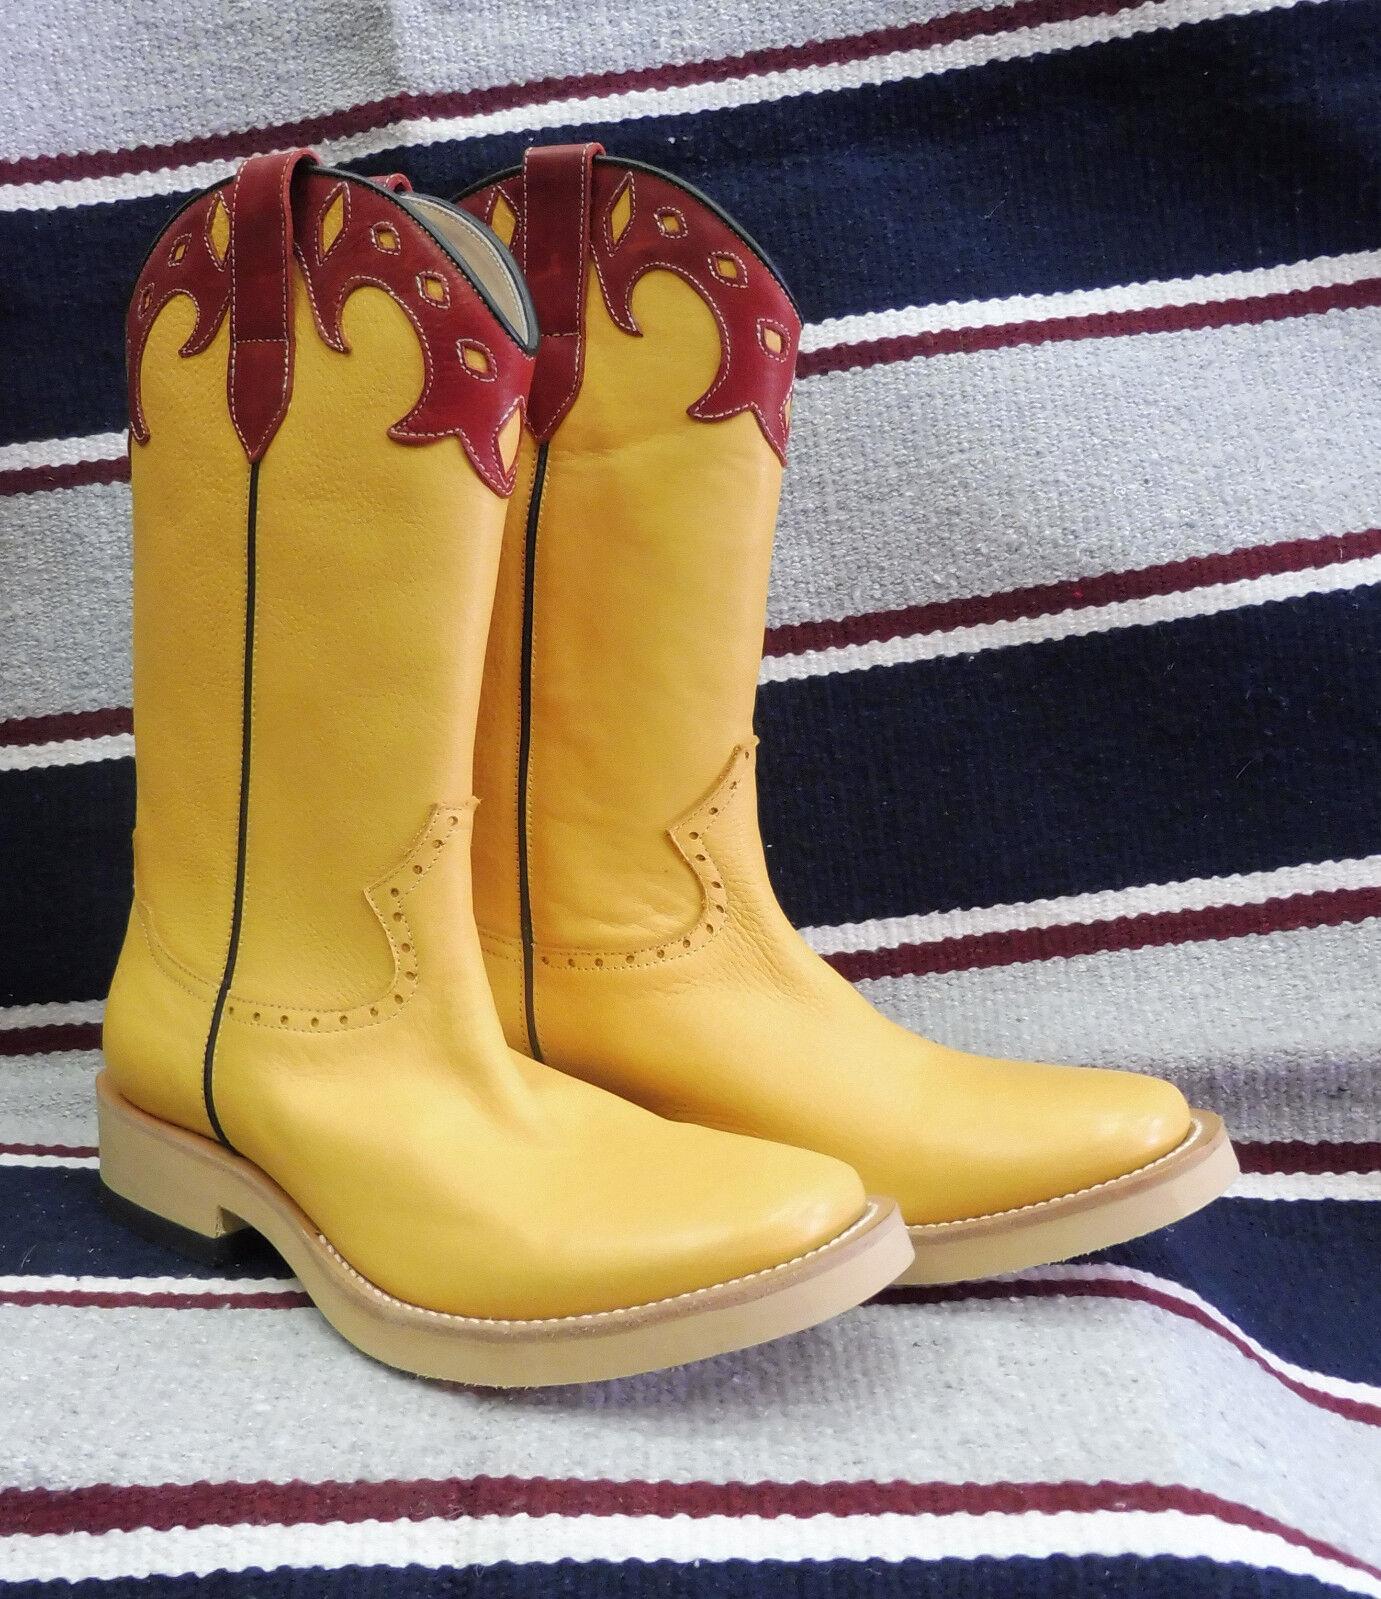 A212 Stivali stivale roper texani country monta western cowboy BARKLEY giallo 42